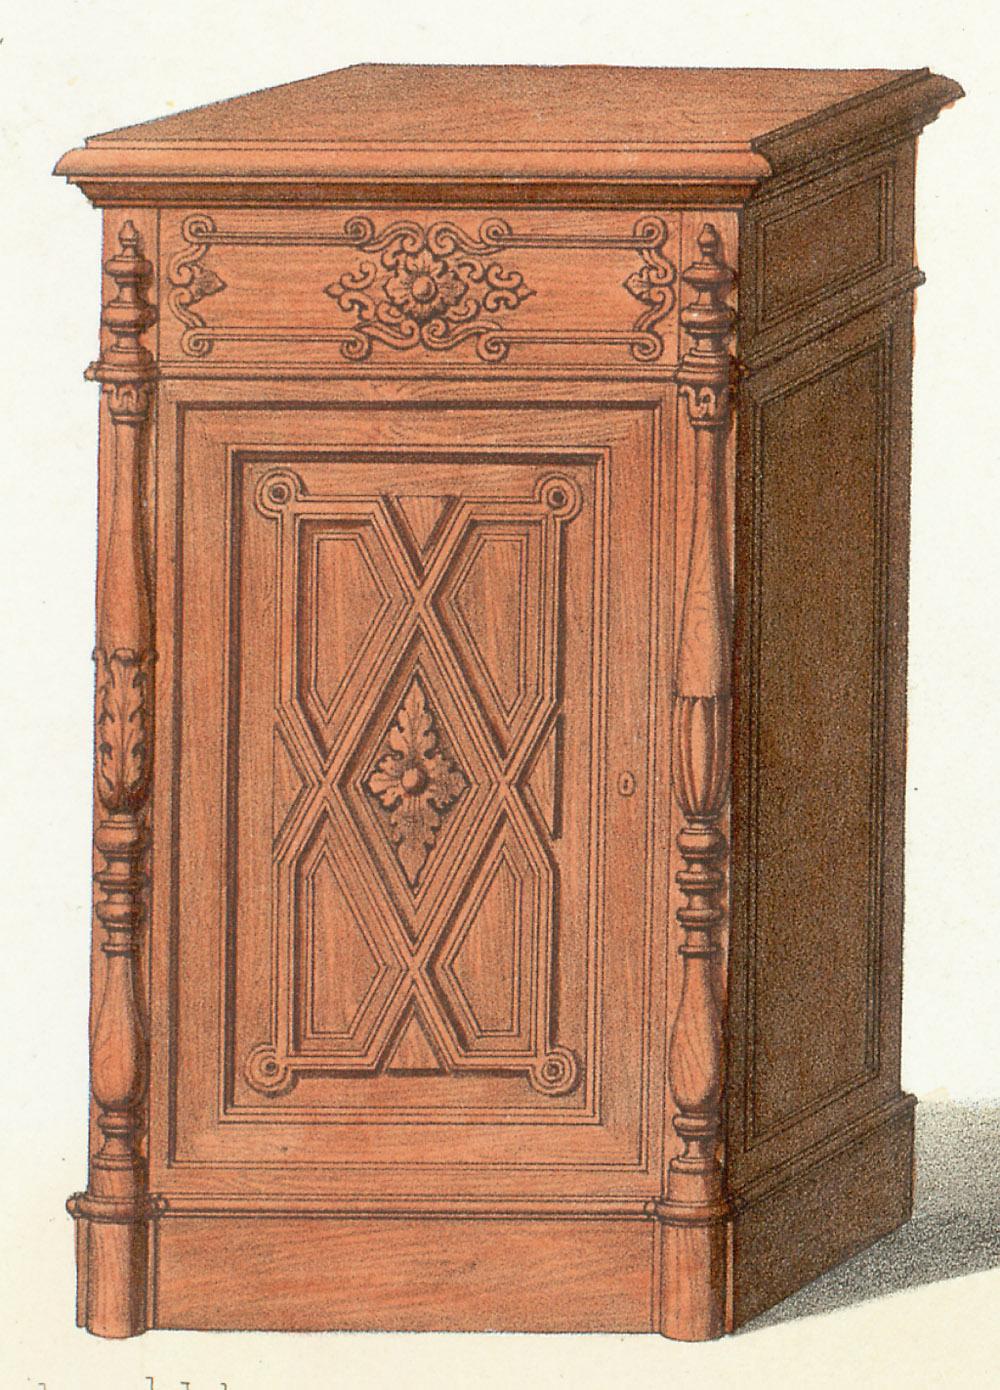 Cabinets (case furniture),  Image number:SIL12-2-221b